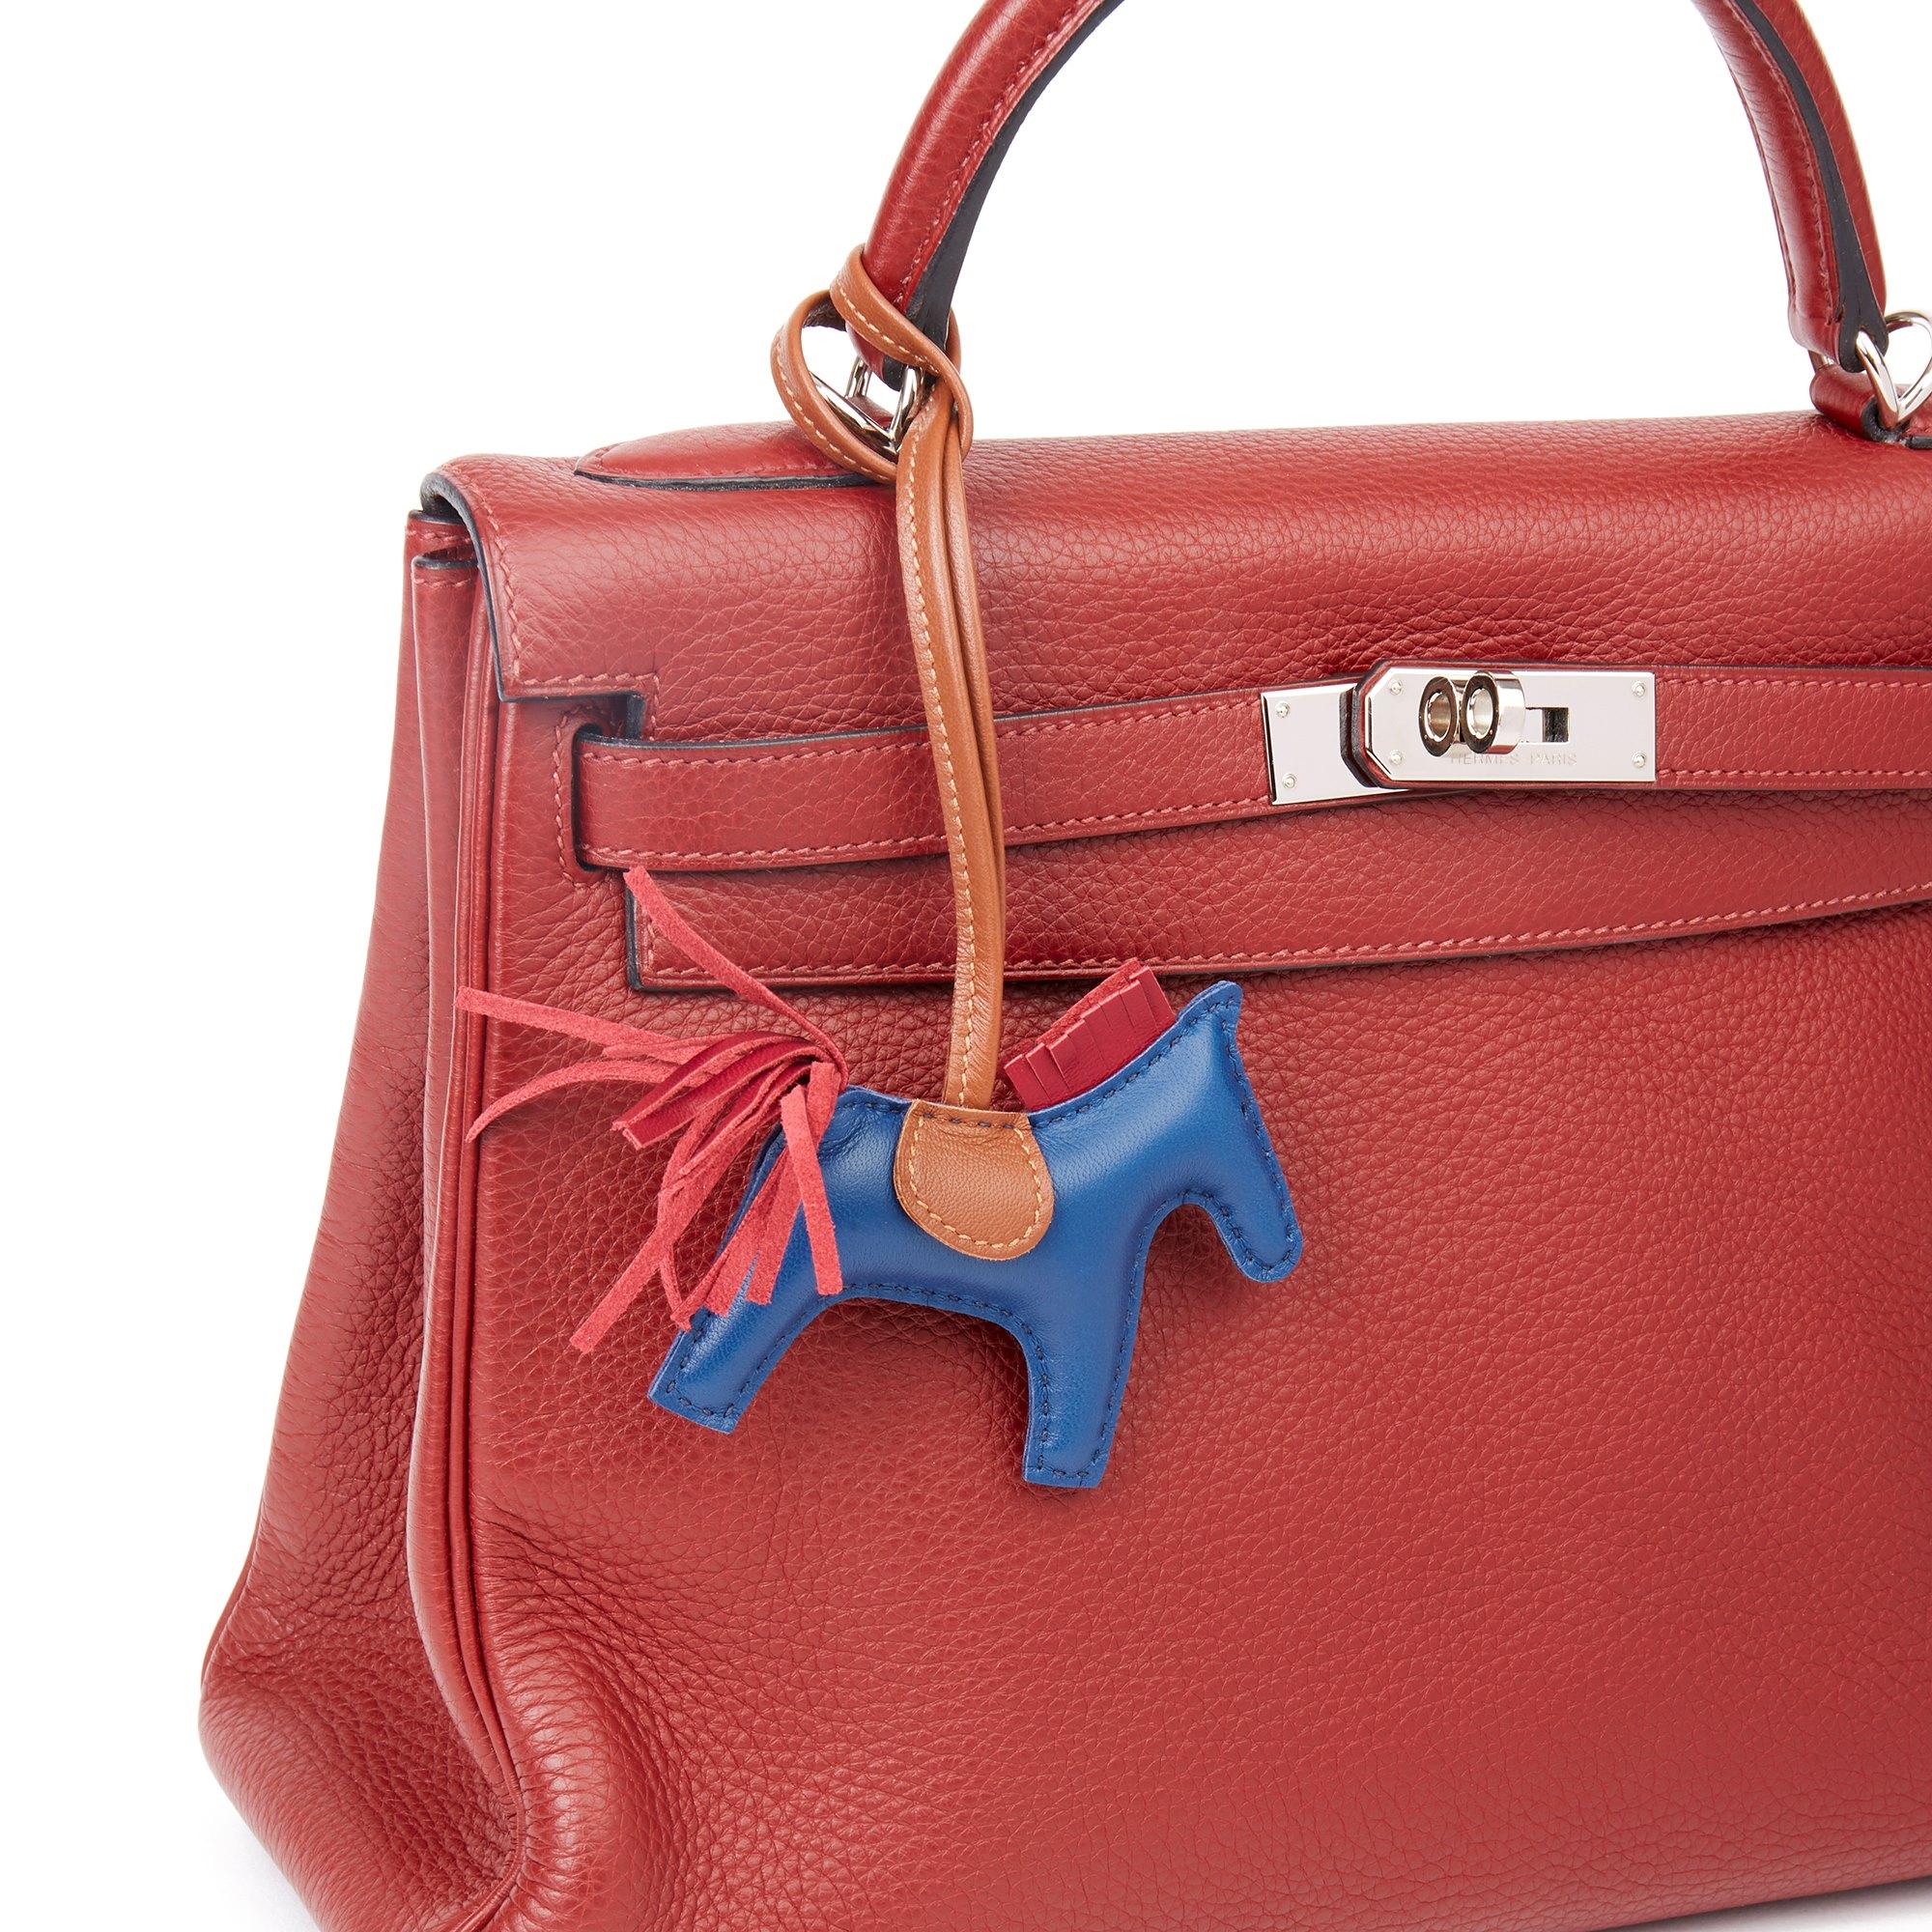 Hermès Fauve, Rubis & Bleu de Malte Swift Leather Rodeo PM